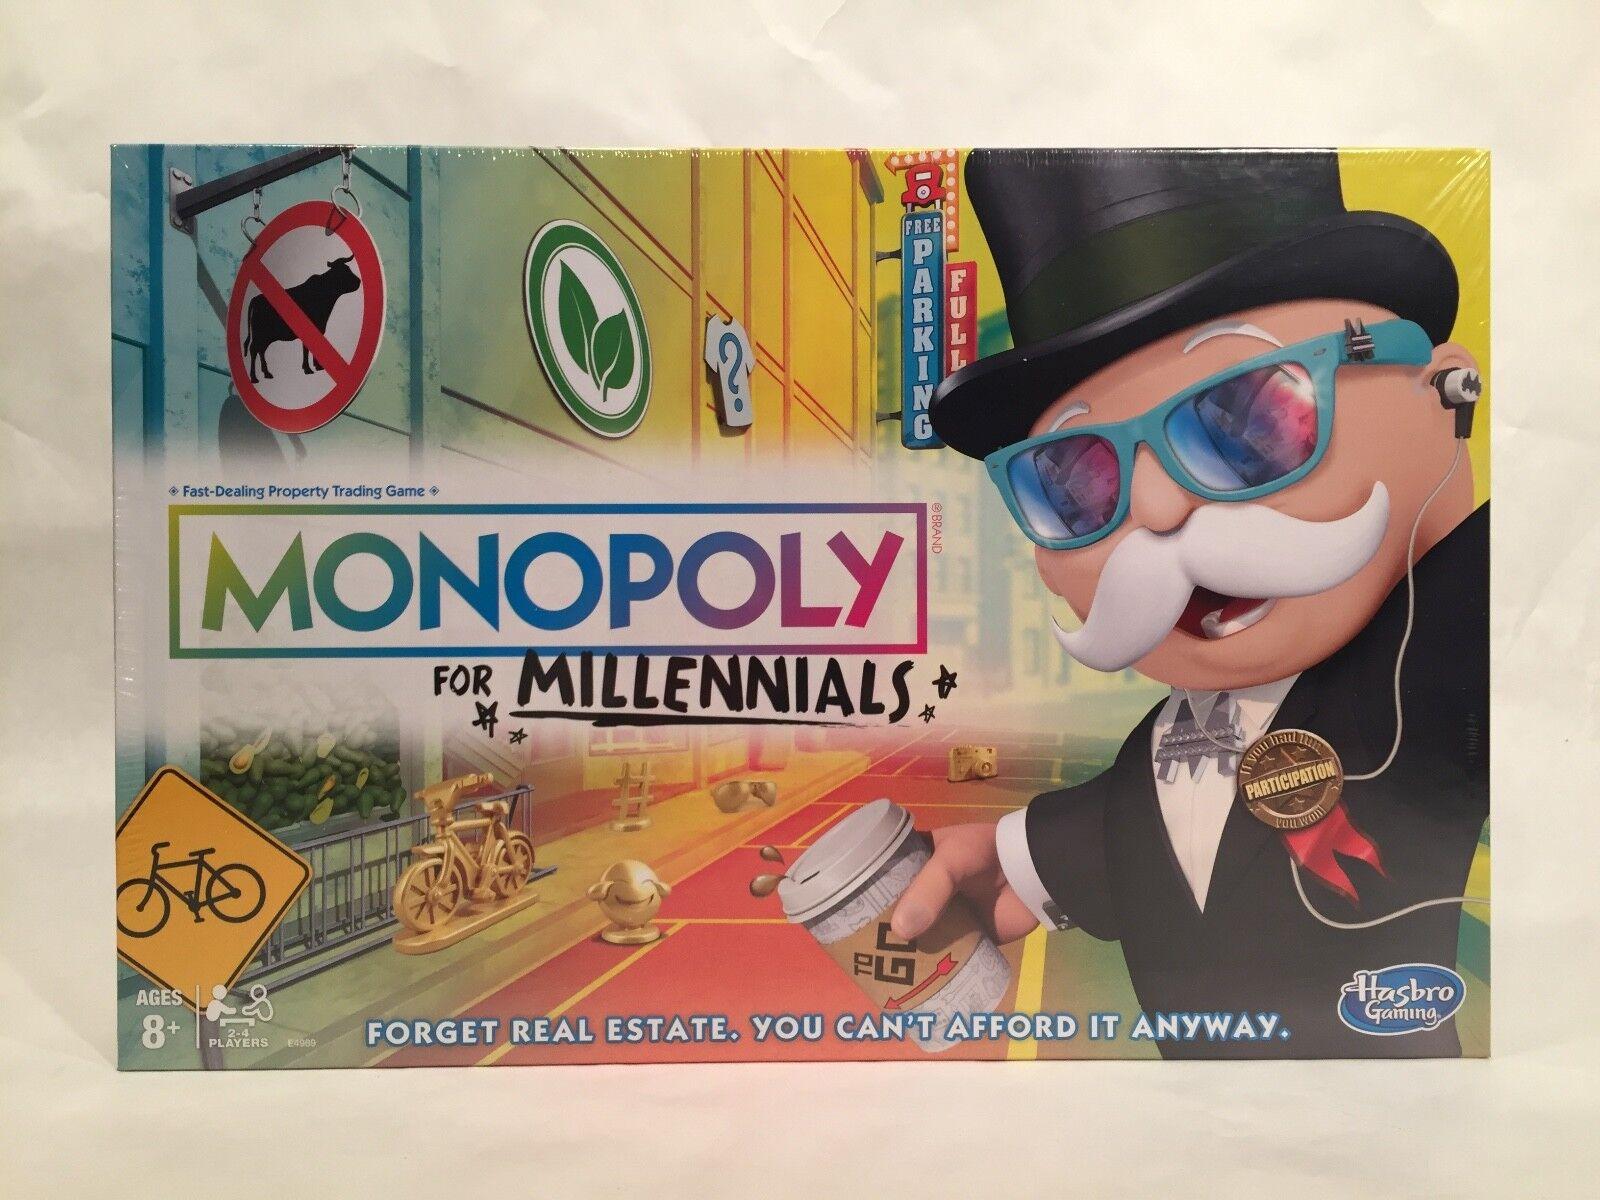 a buon mercato Monopoly for Millennials tavola gioco • Hasbro Hasbro Hasbro Gaming    Parker Brossohers •nuovo   negozio d'offerta